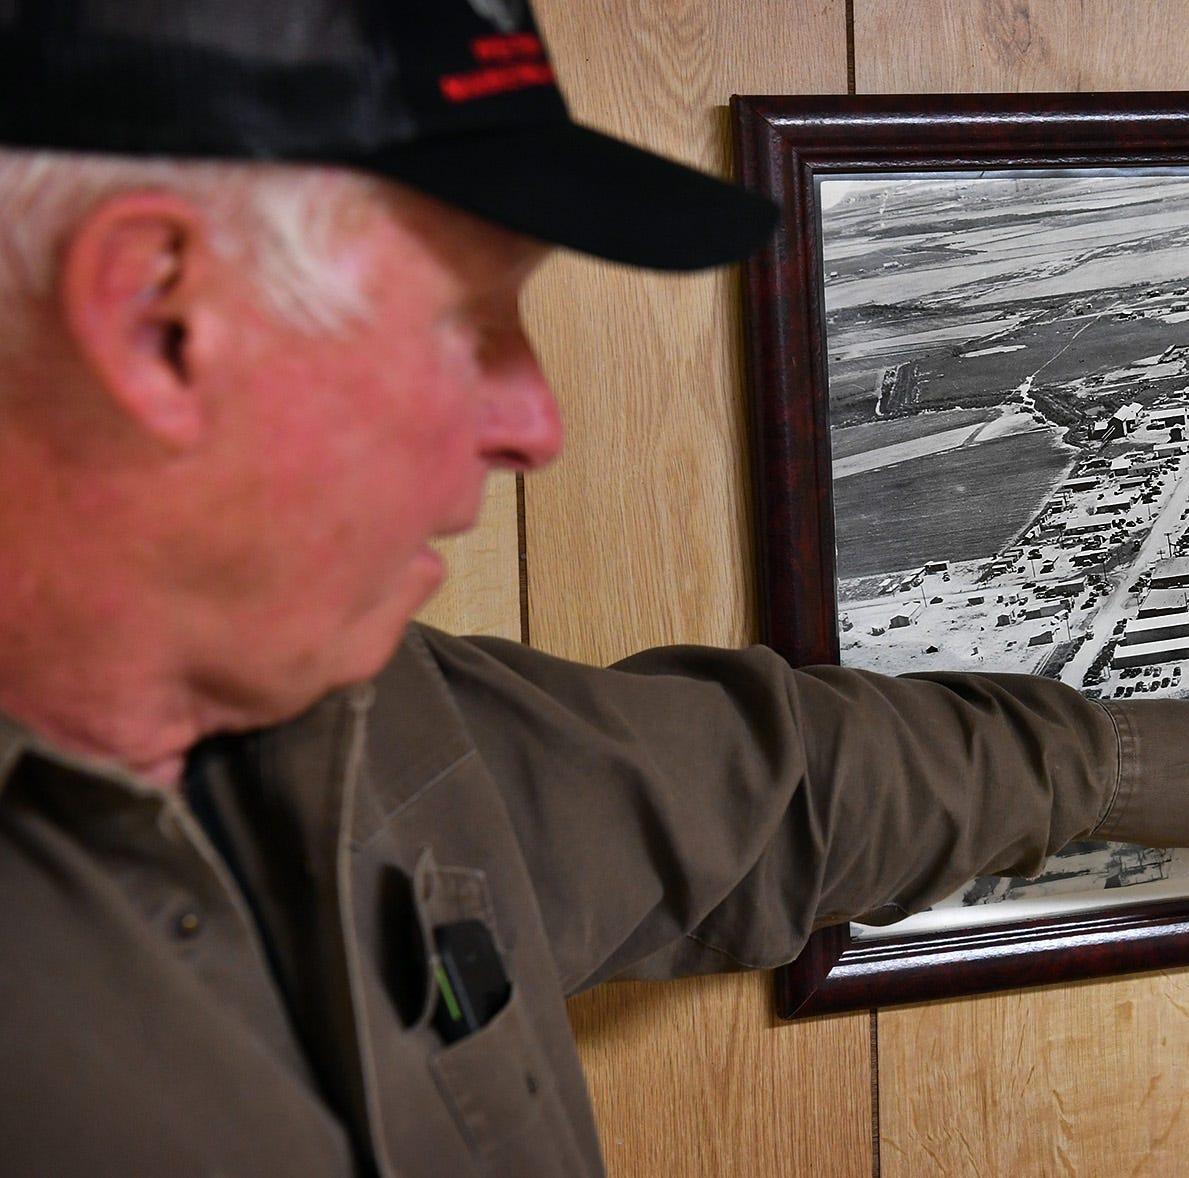 'Texas tea': Kamay celebrates 100 years of oil history